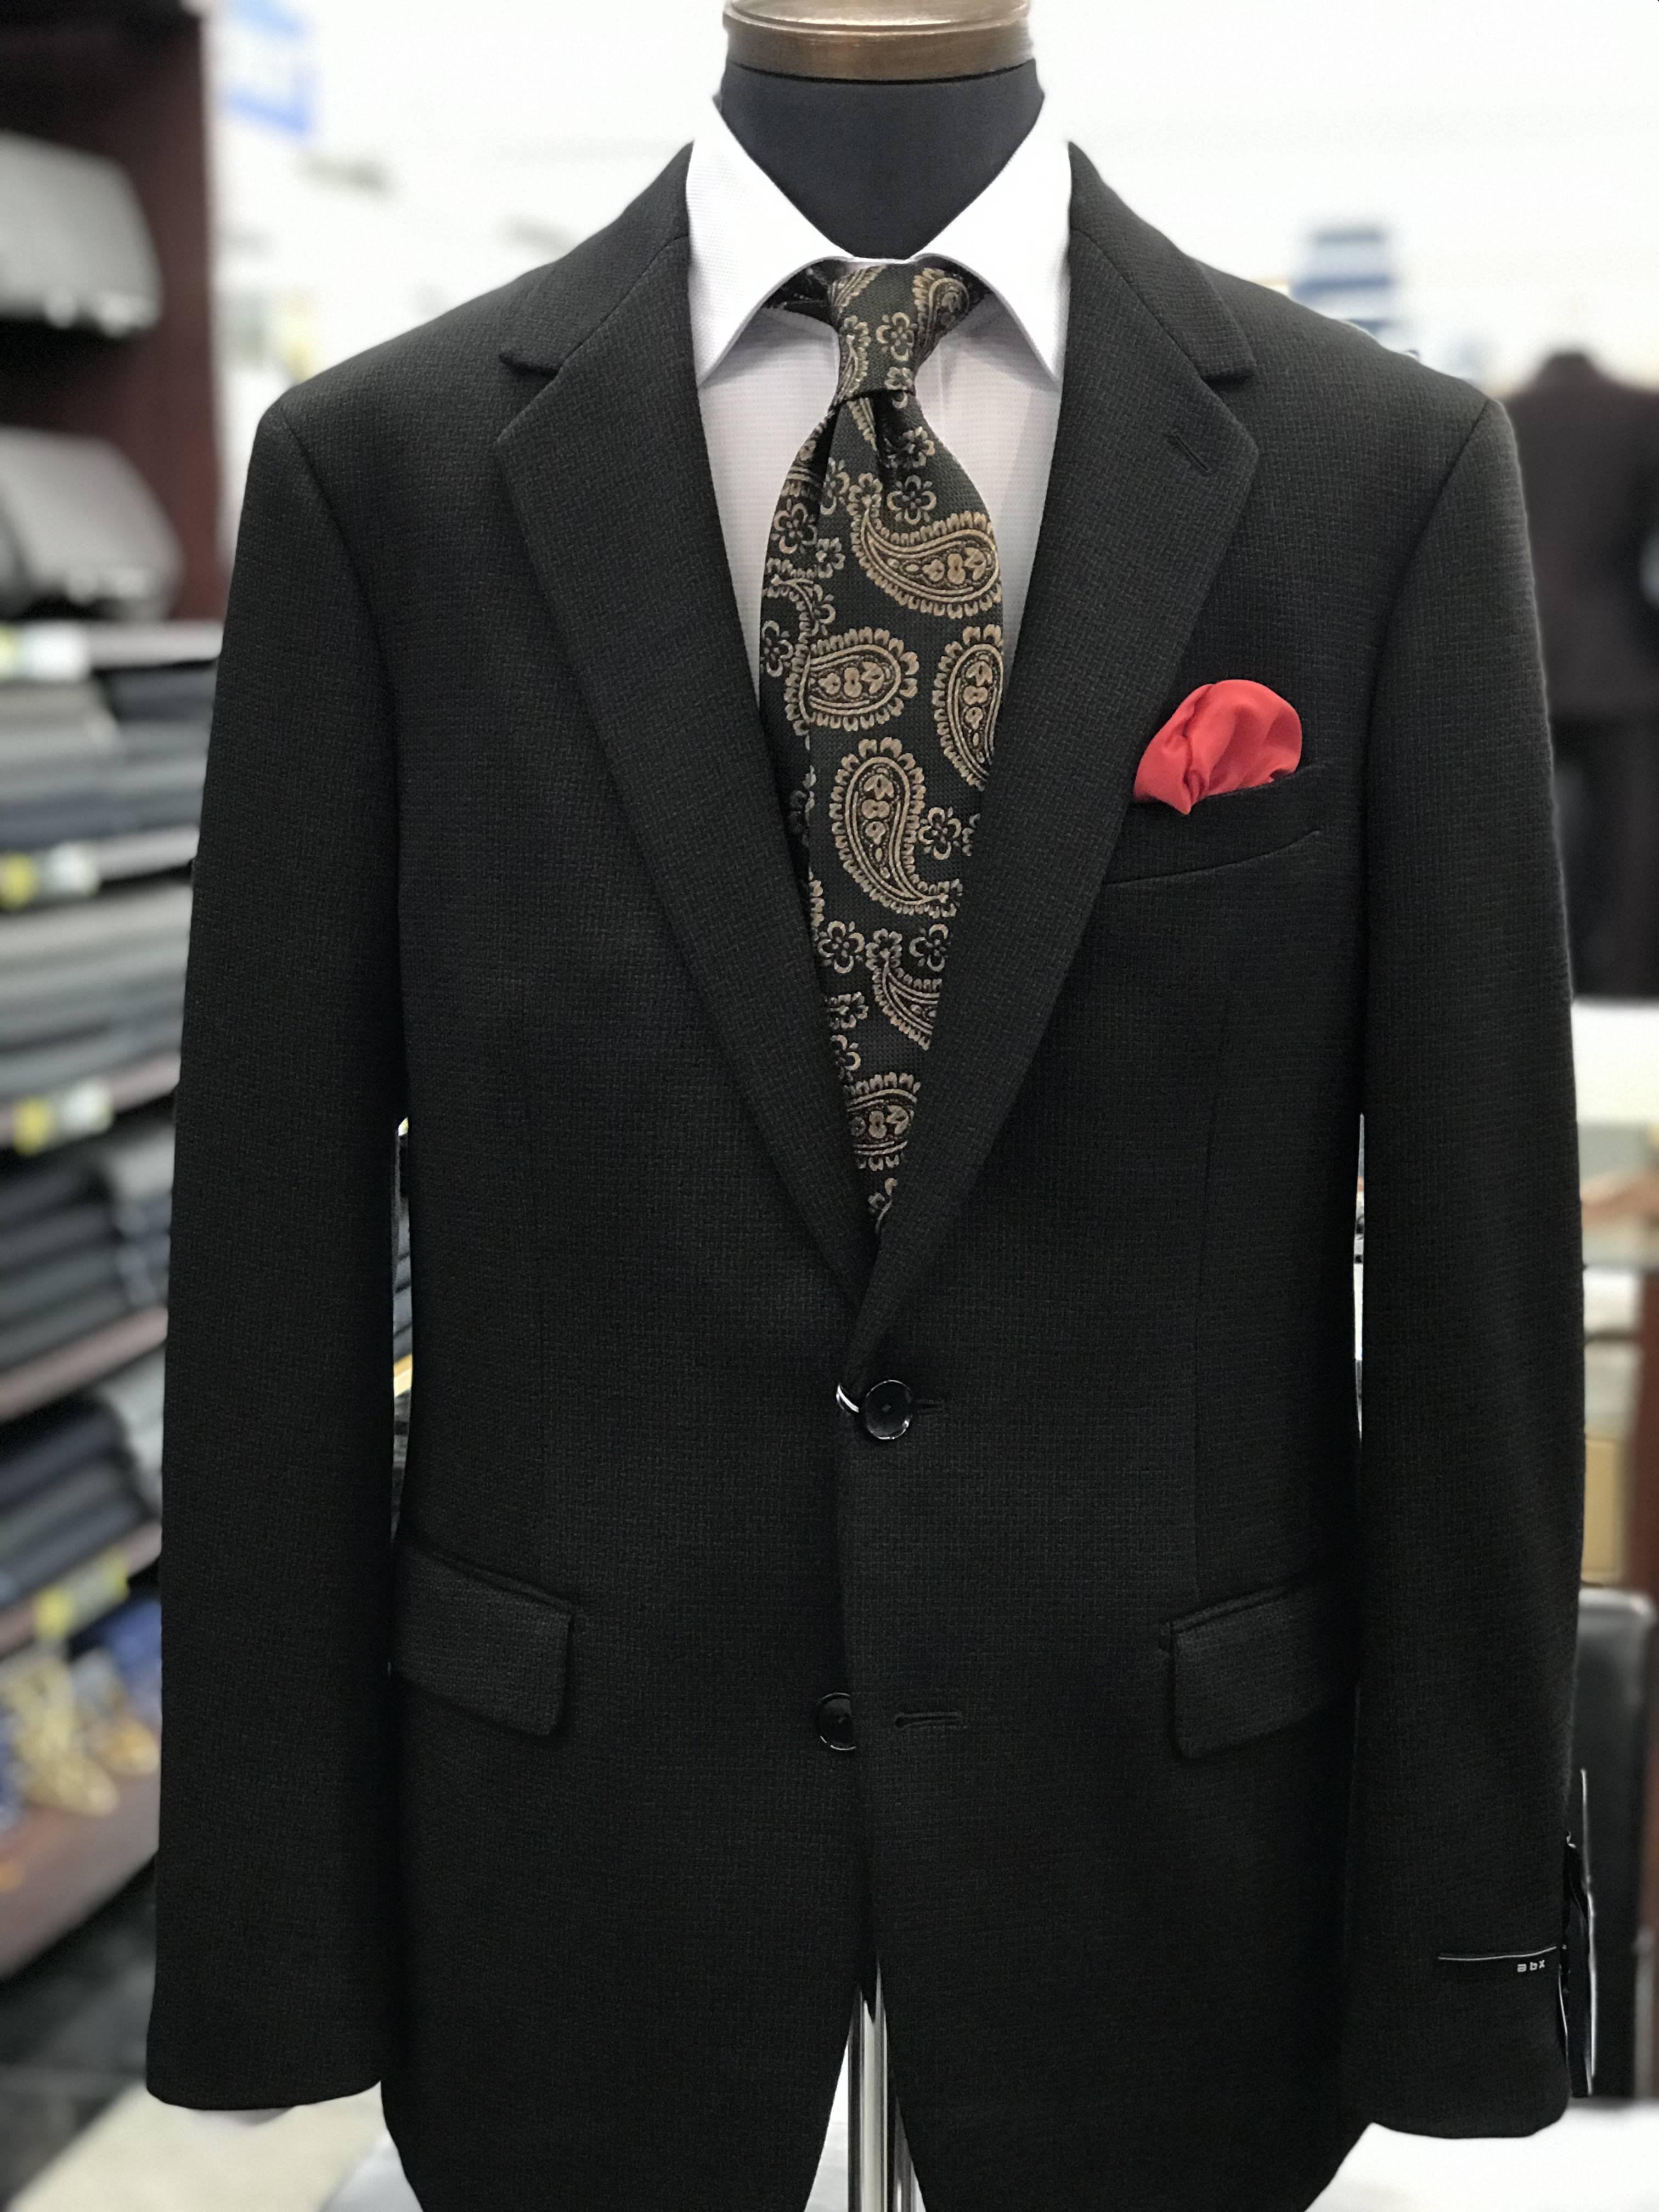 abxのニット生地スーツ